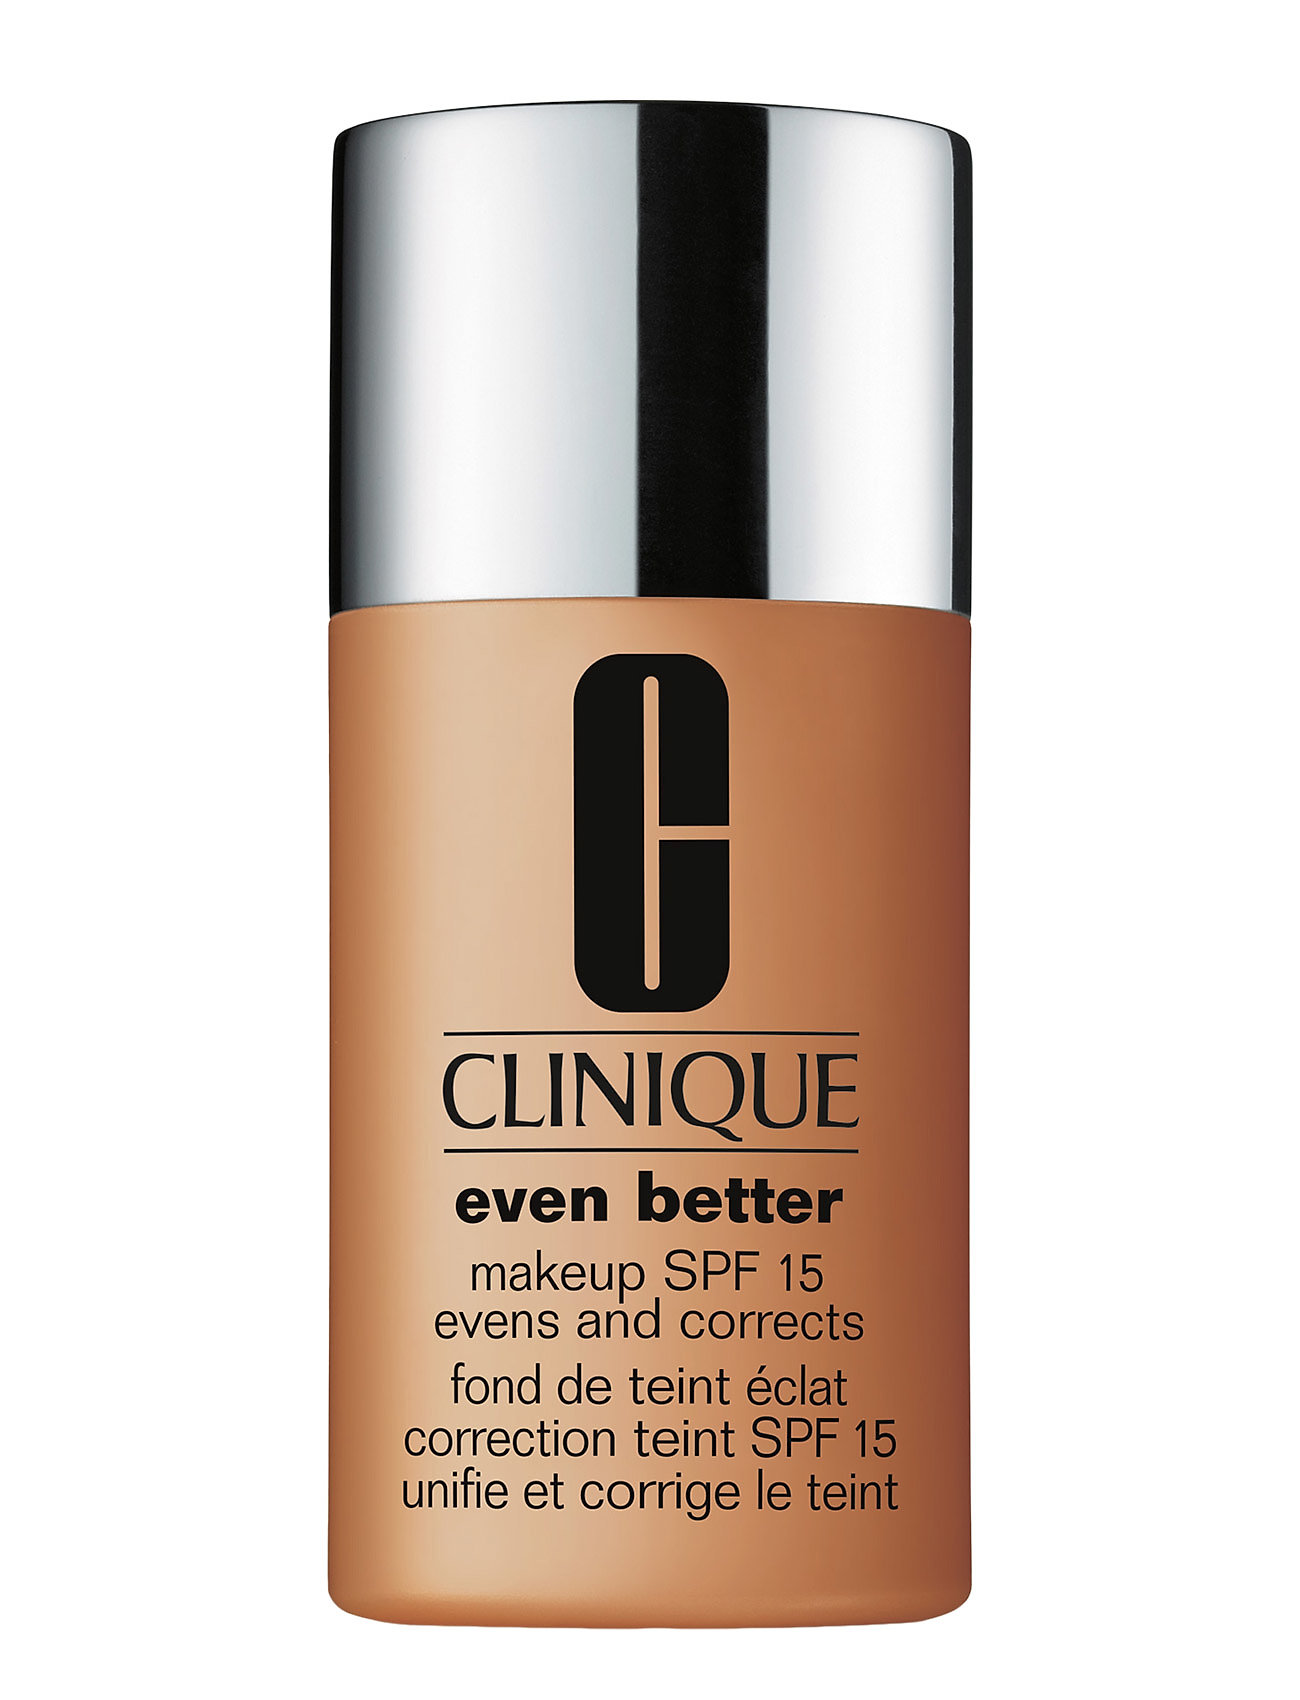 Clinique Even Better Makeup WN 115.5 Mocha 30ml - WN 115.5 MOCHA 30ML